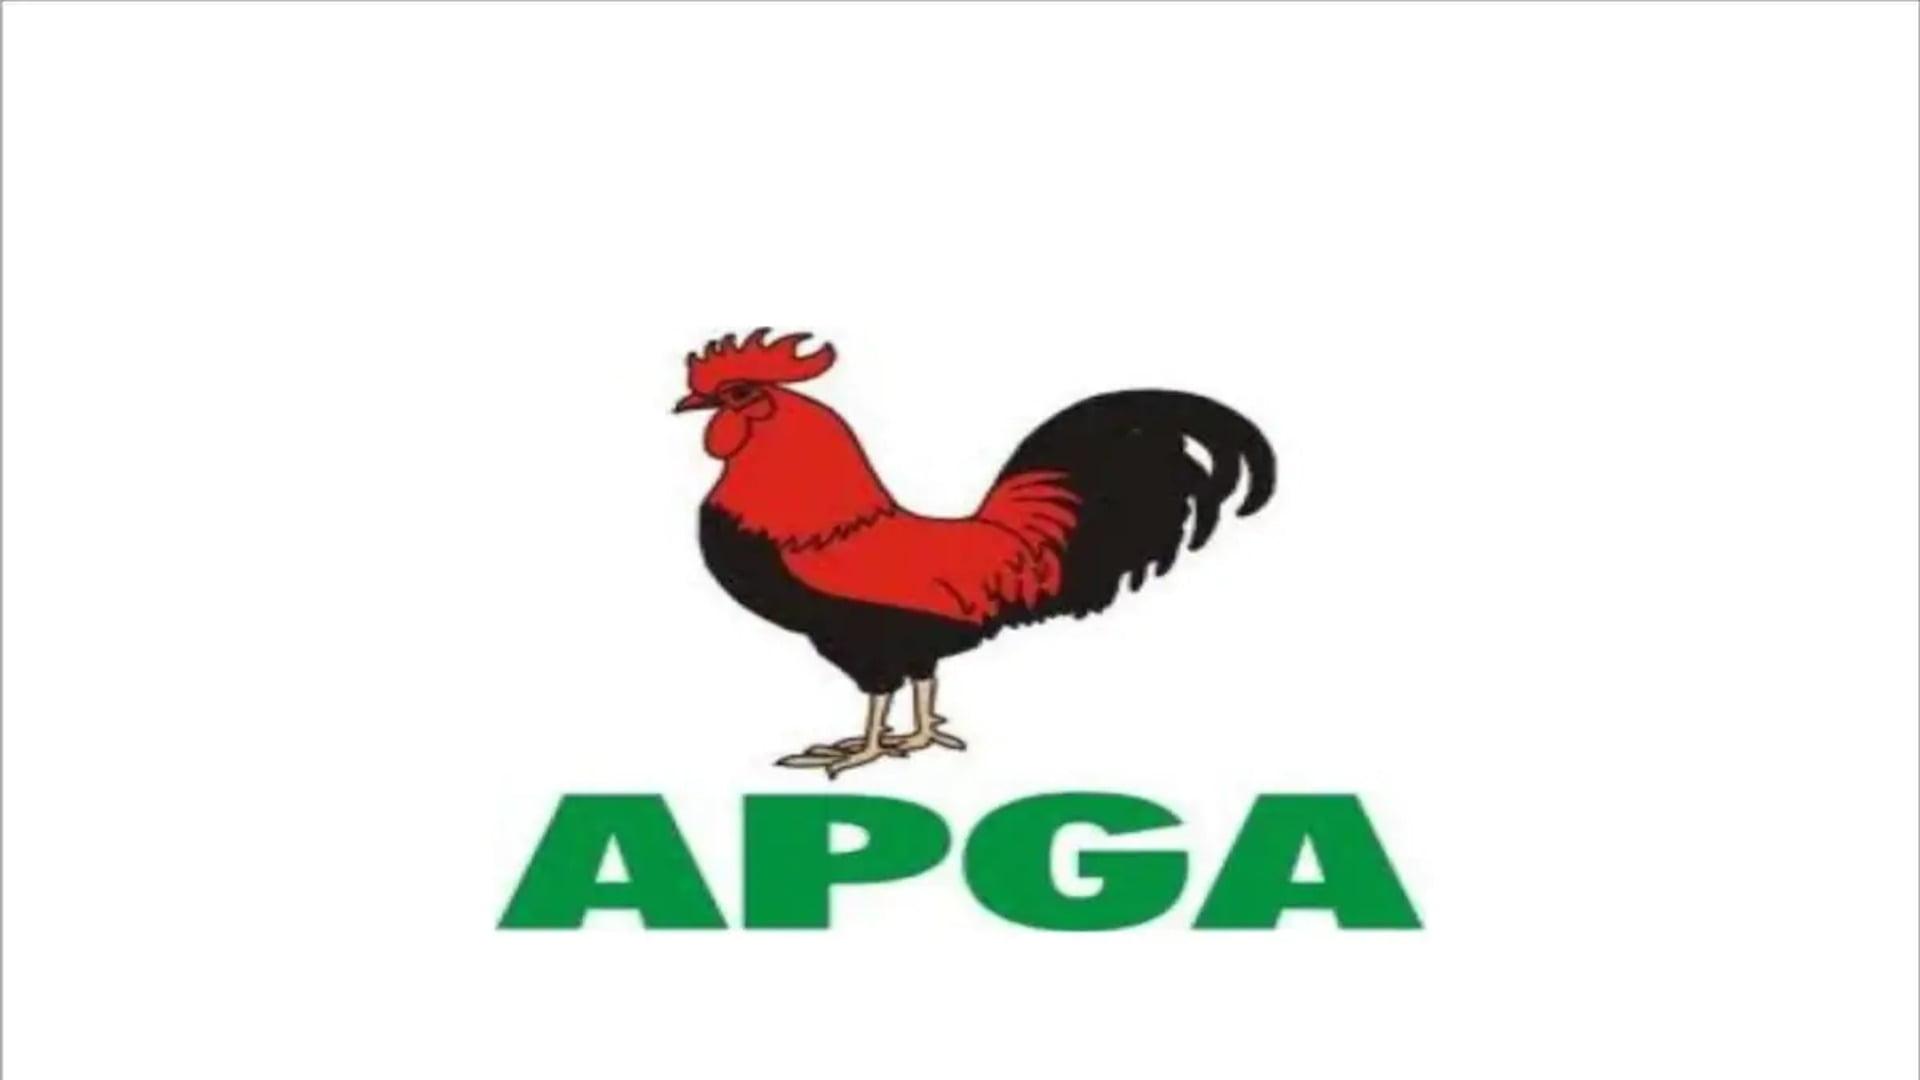 Stop Using Brutal Force On Opposition, APGA Tells Buhari